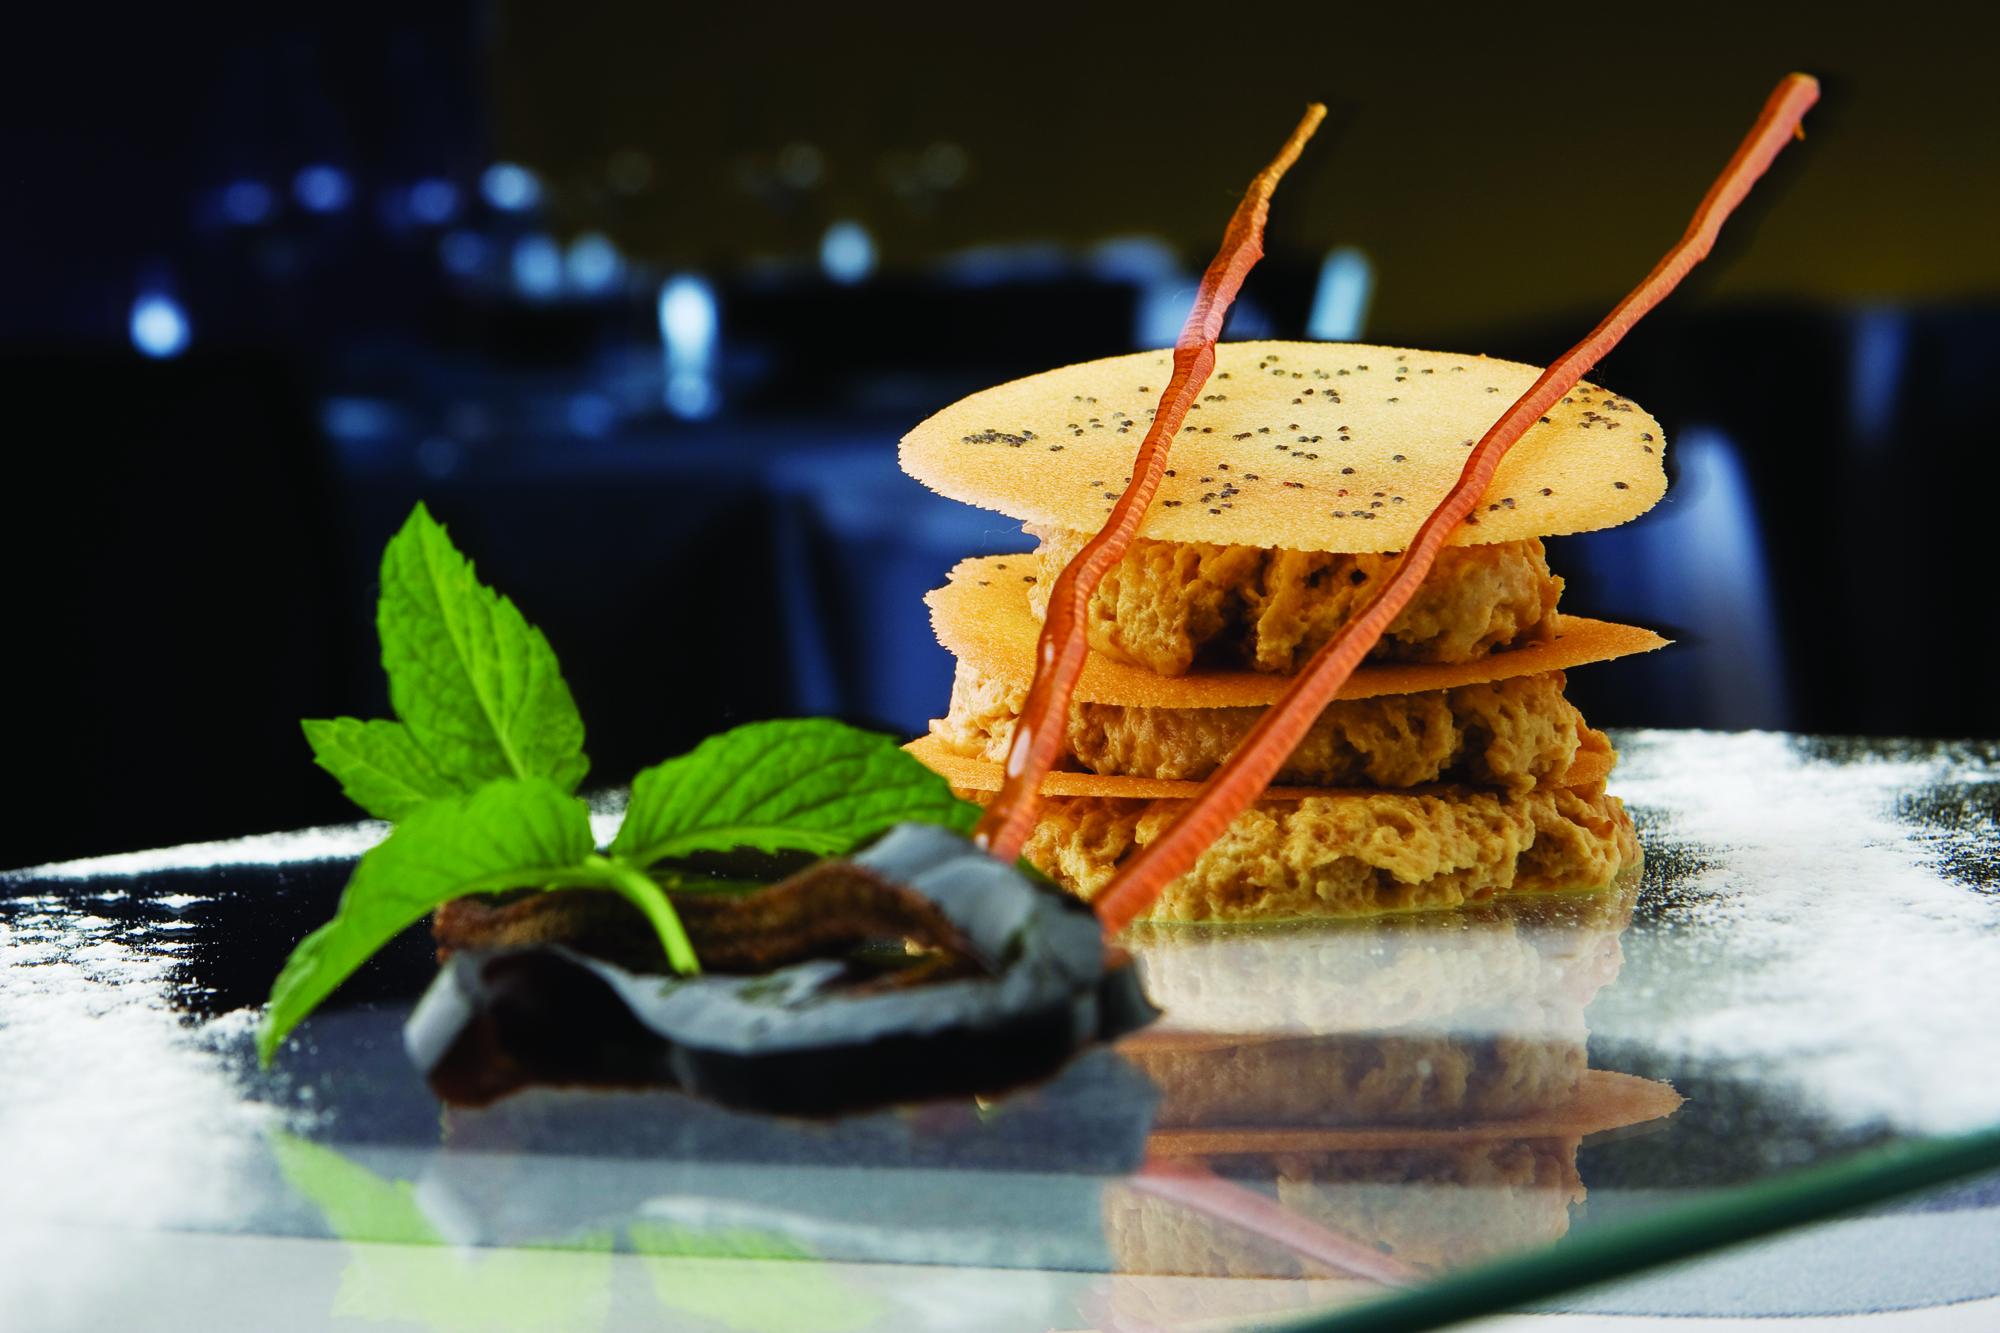 Cocina de vanguardia tecno emocional o cocina molecular for Cocina vanguardia definicion